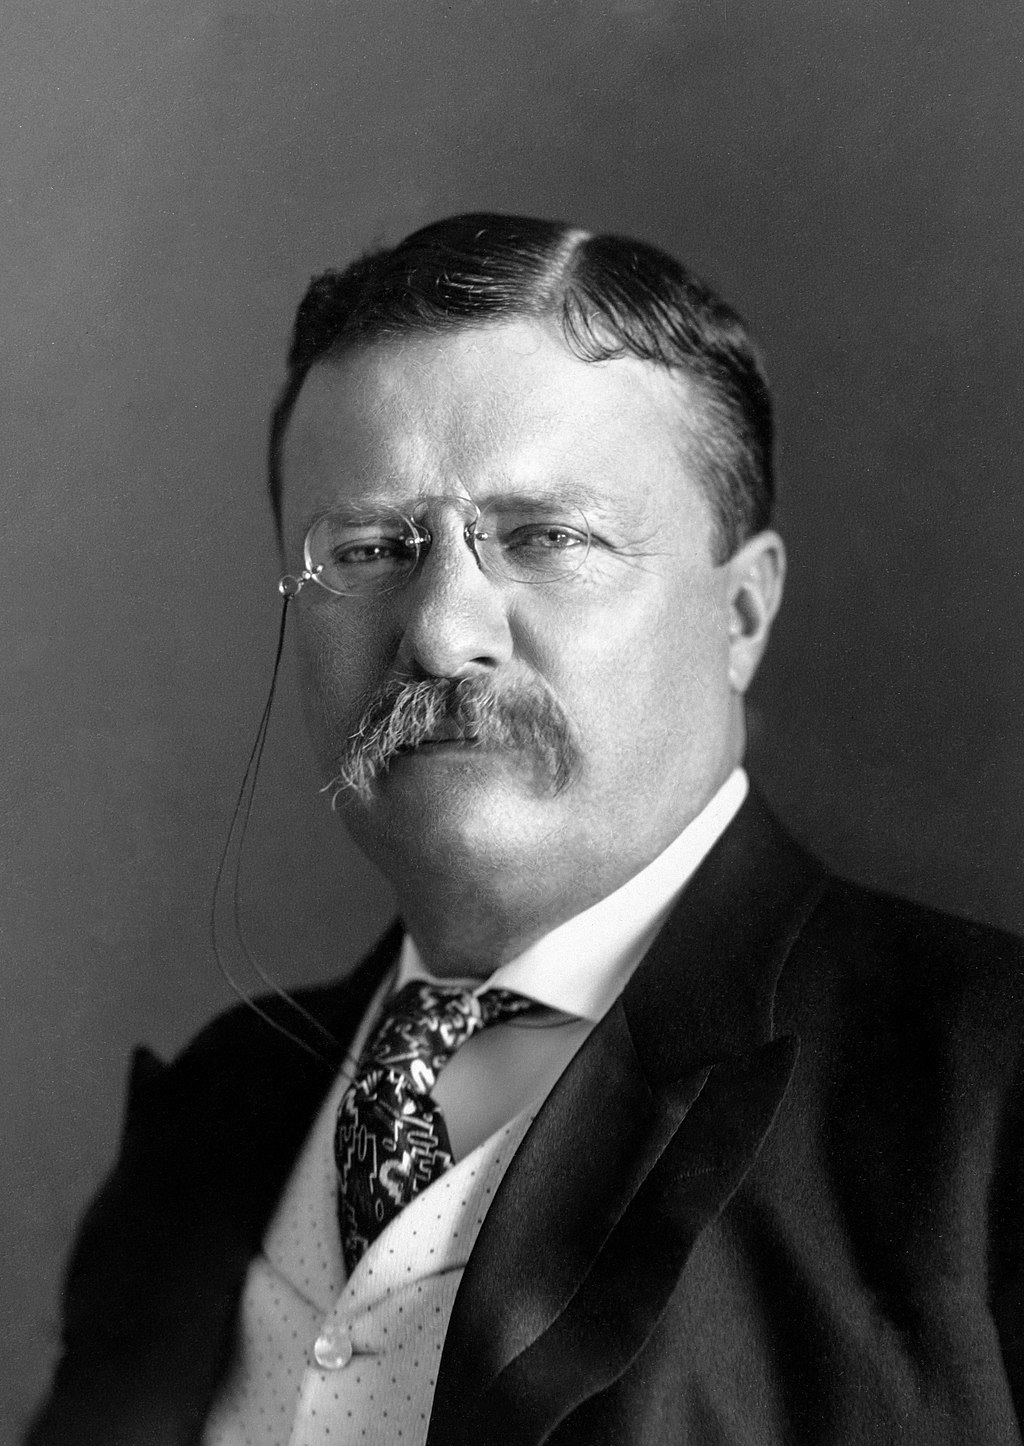 1024px-President_Roosevelt_-_Pach_Bros.jpg